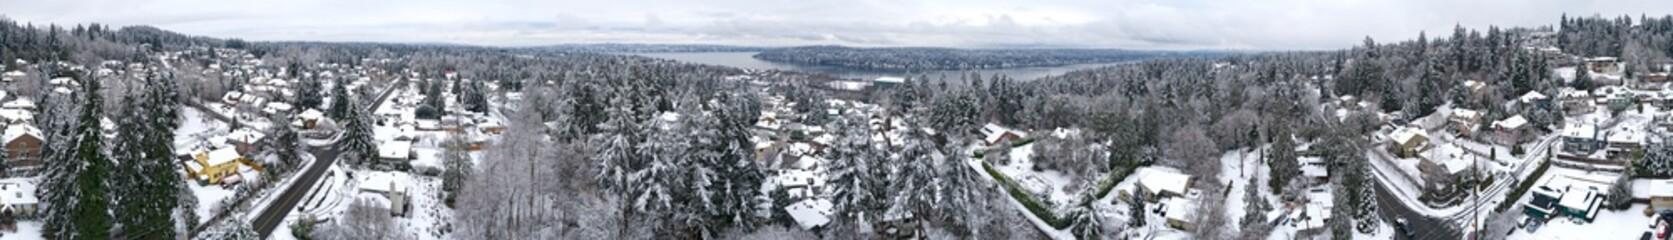 360 Panoramic View Newcastle Washington Snowy Day